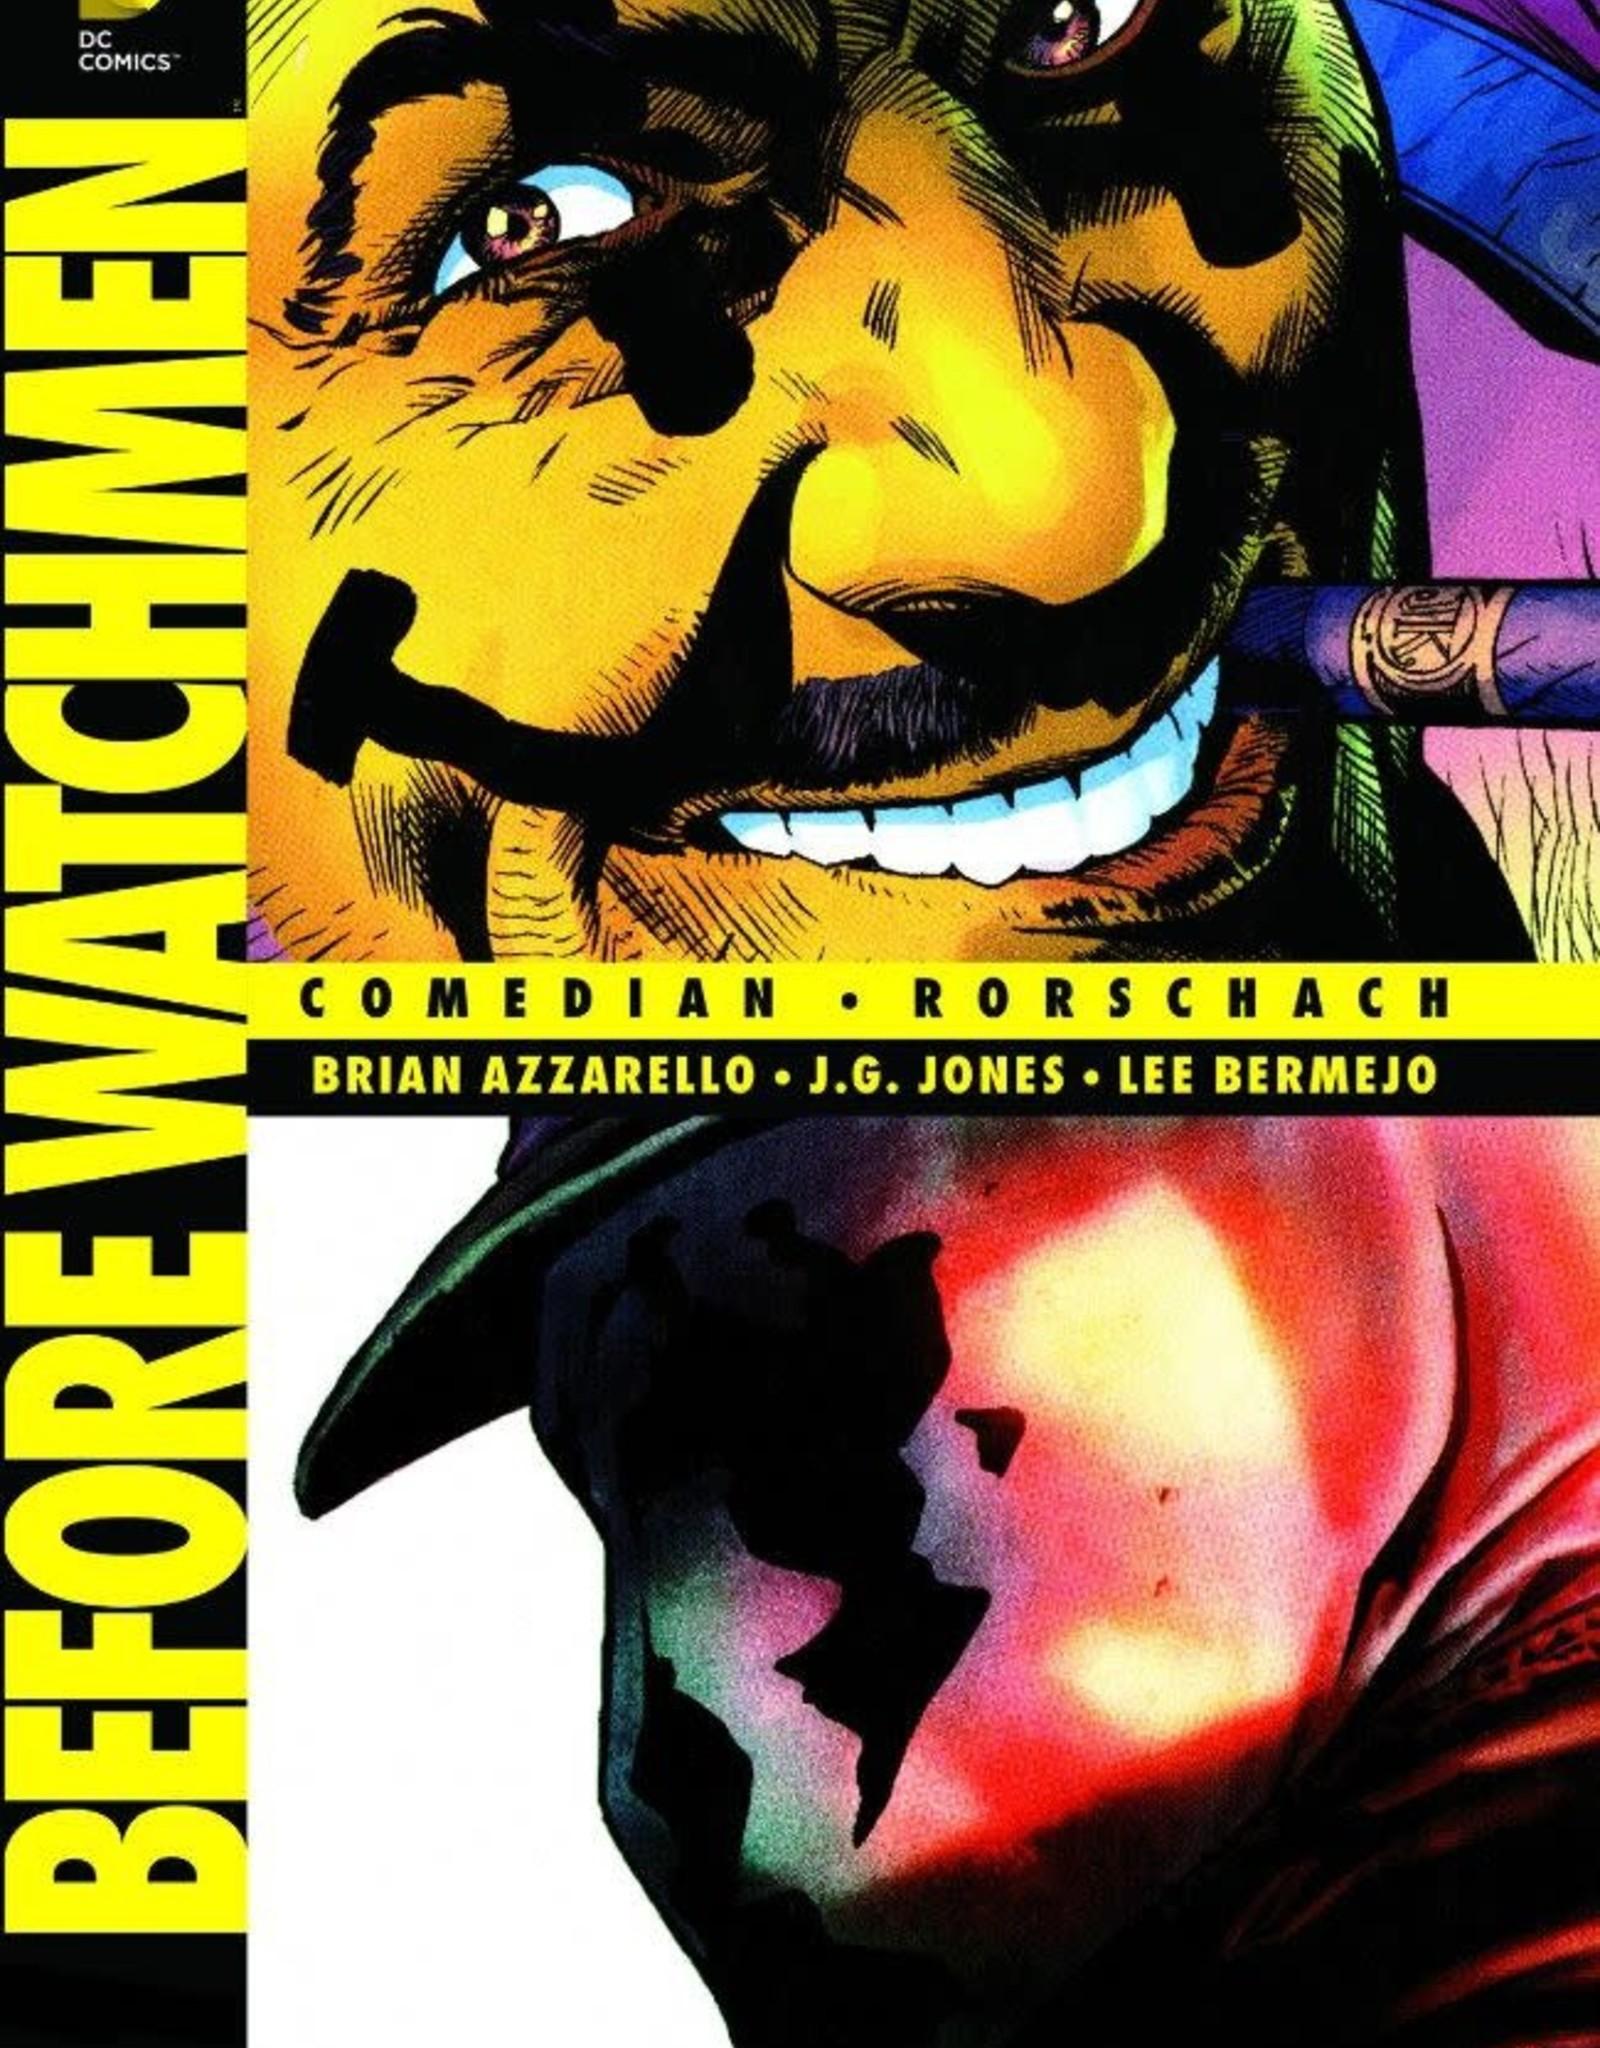 DC Comics Before Watchmen Comedian-Rorschach